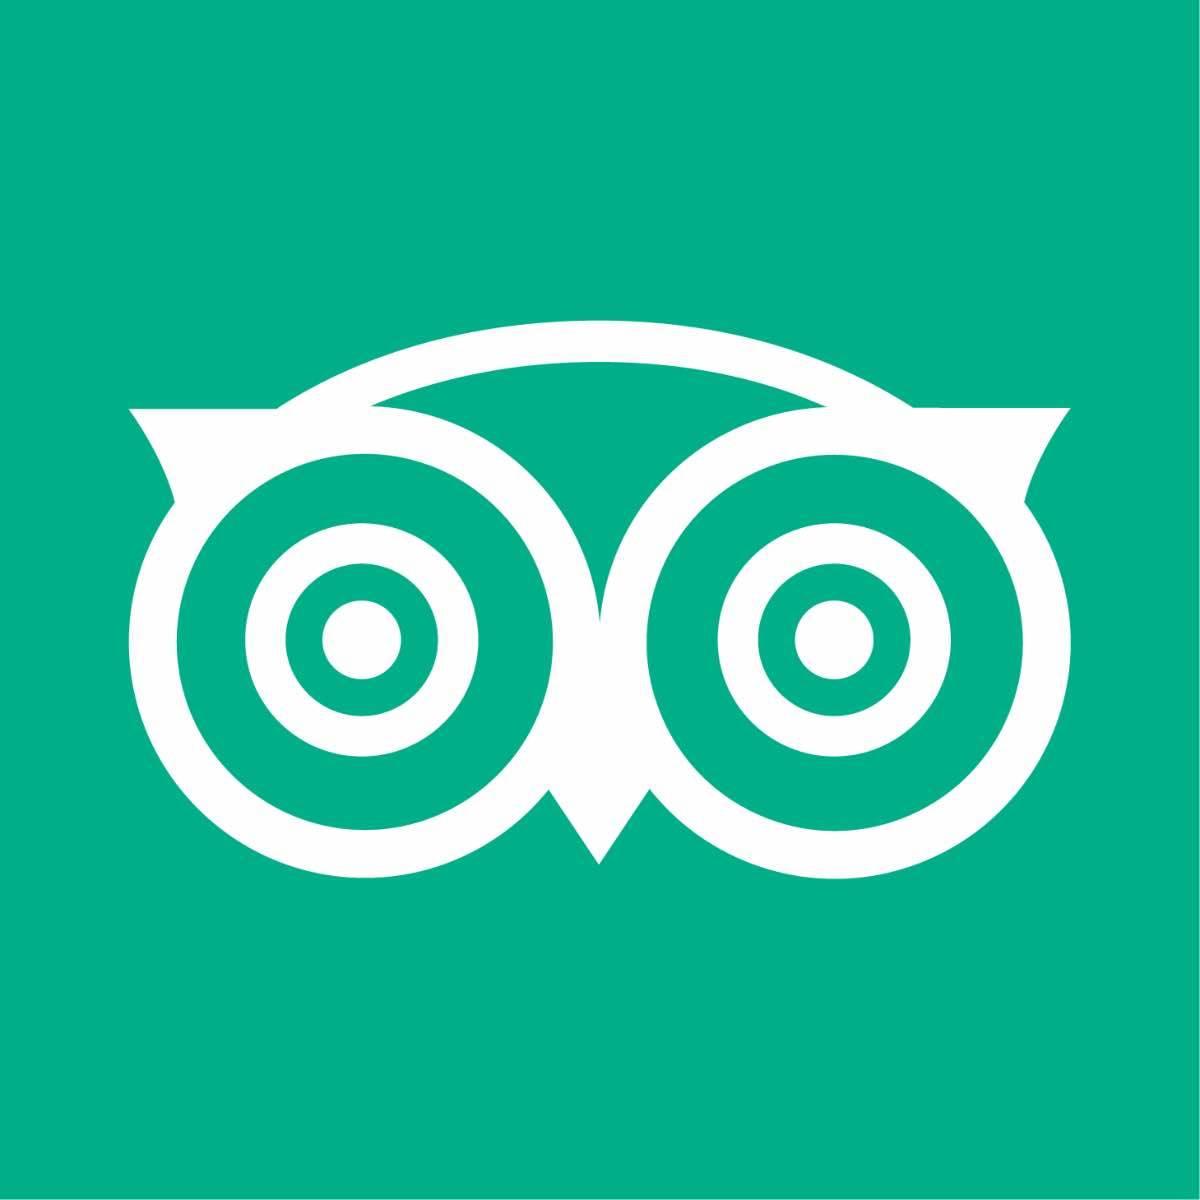 Bloccate più di 1 milione di recensioni false su TripAdvisor tutte le info